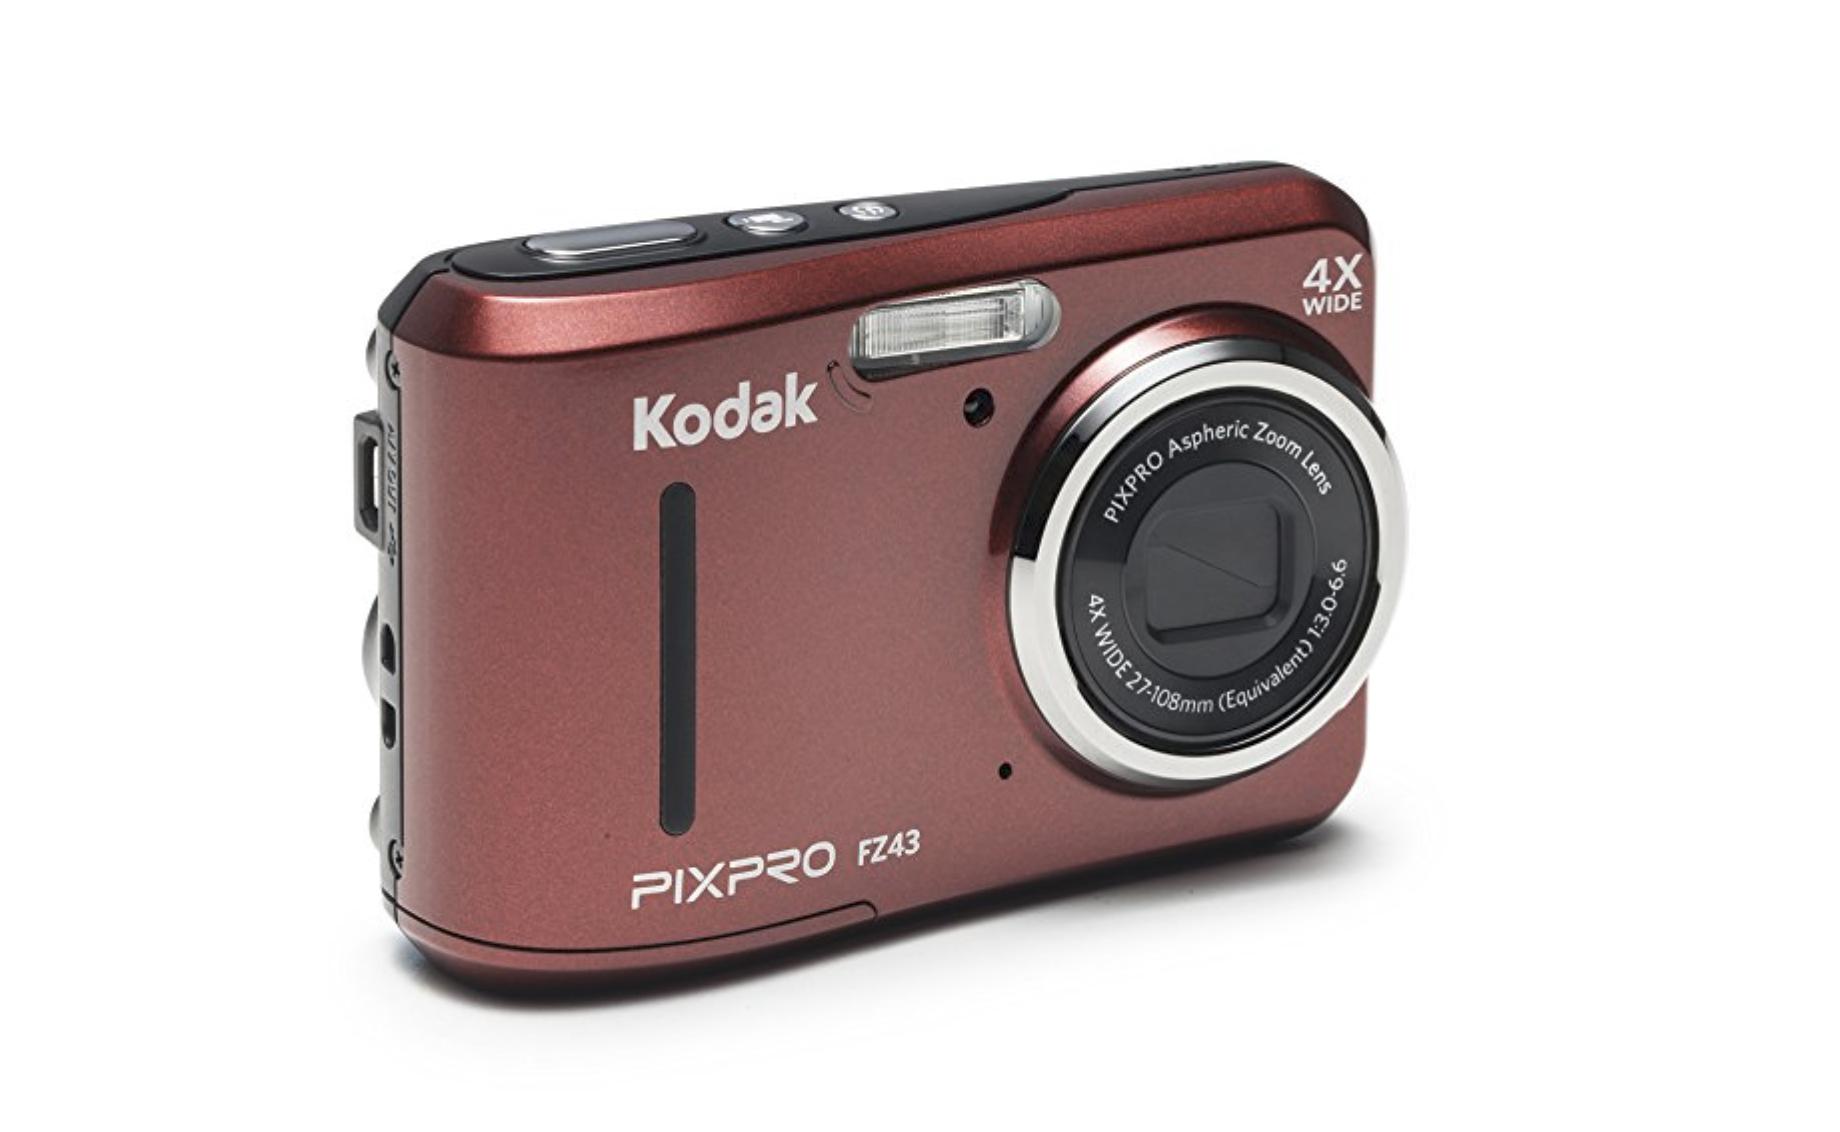 kodak pixpro red camera